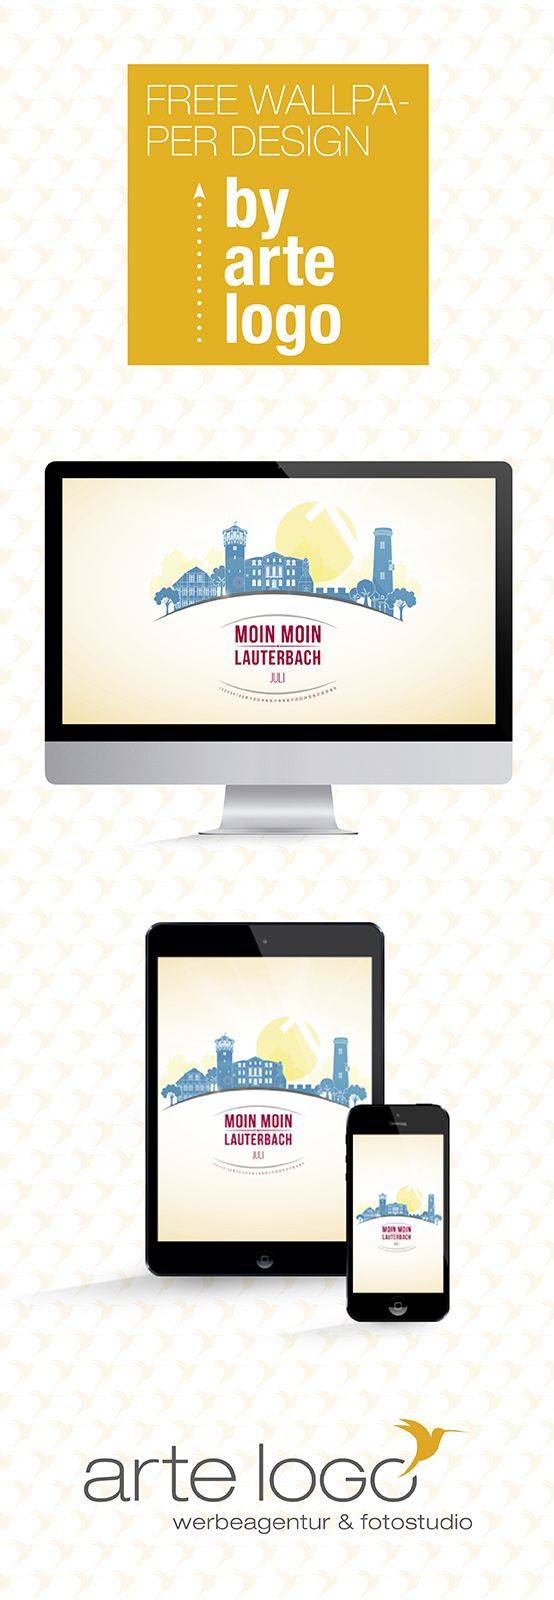 Free Wallpaper for Desktop, iPhone and iPad by arte-logo.de Free Download, Kalender 2016, selfmade, Juli, Skyline Lauterbach, Vogelsbergkreis, Schrittsteine, Ankerturm, Moin Moin, Fachwerkhaus, Hessen